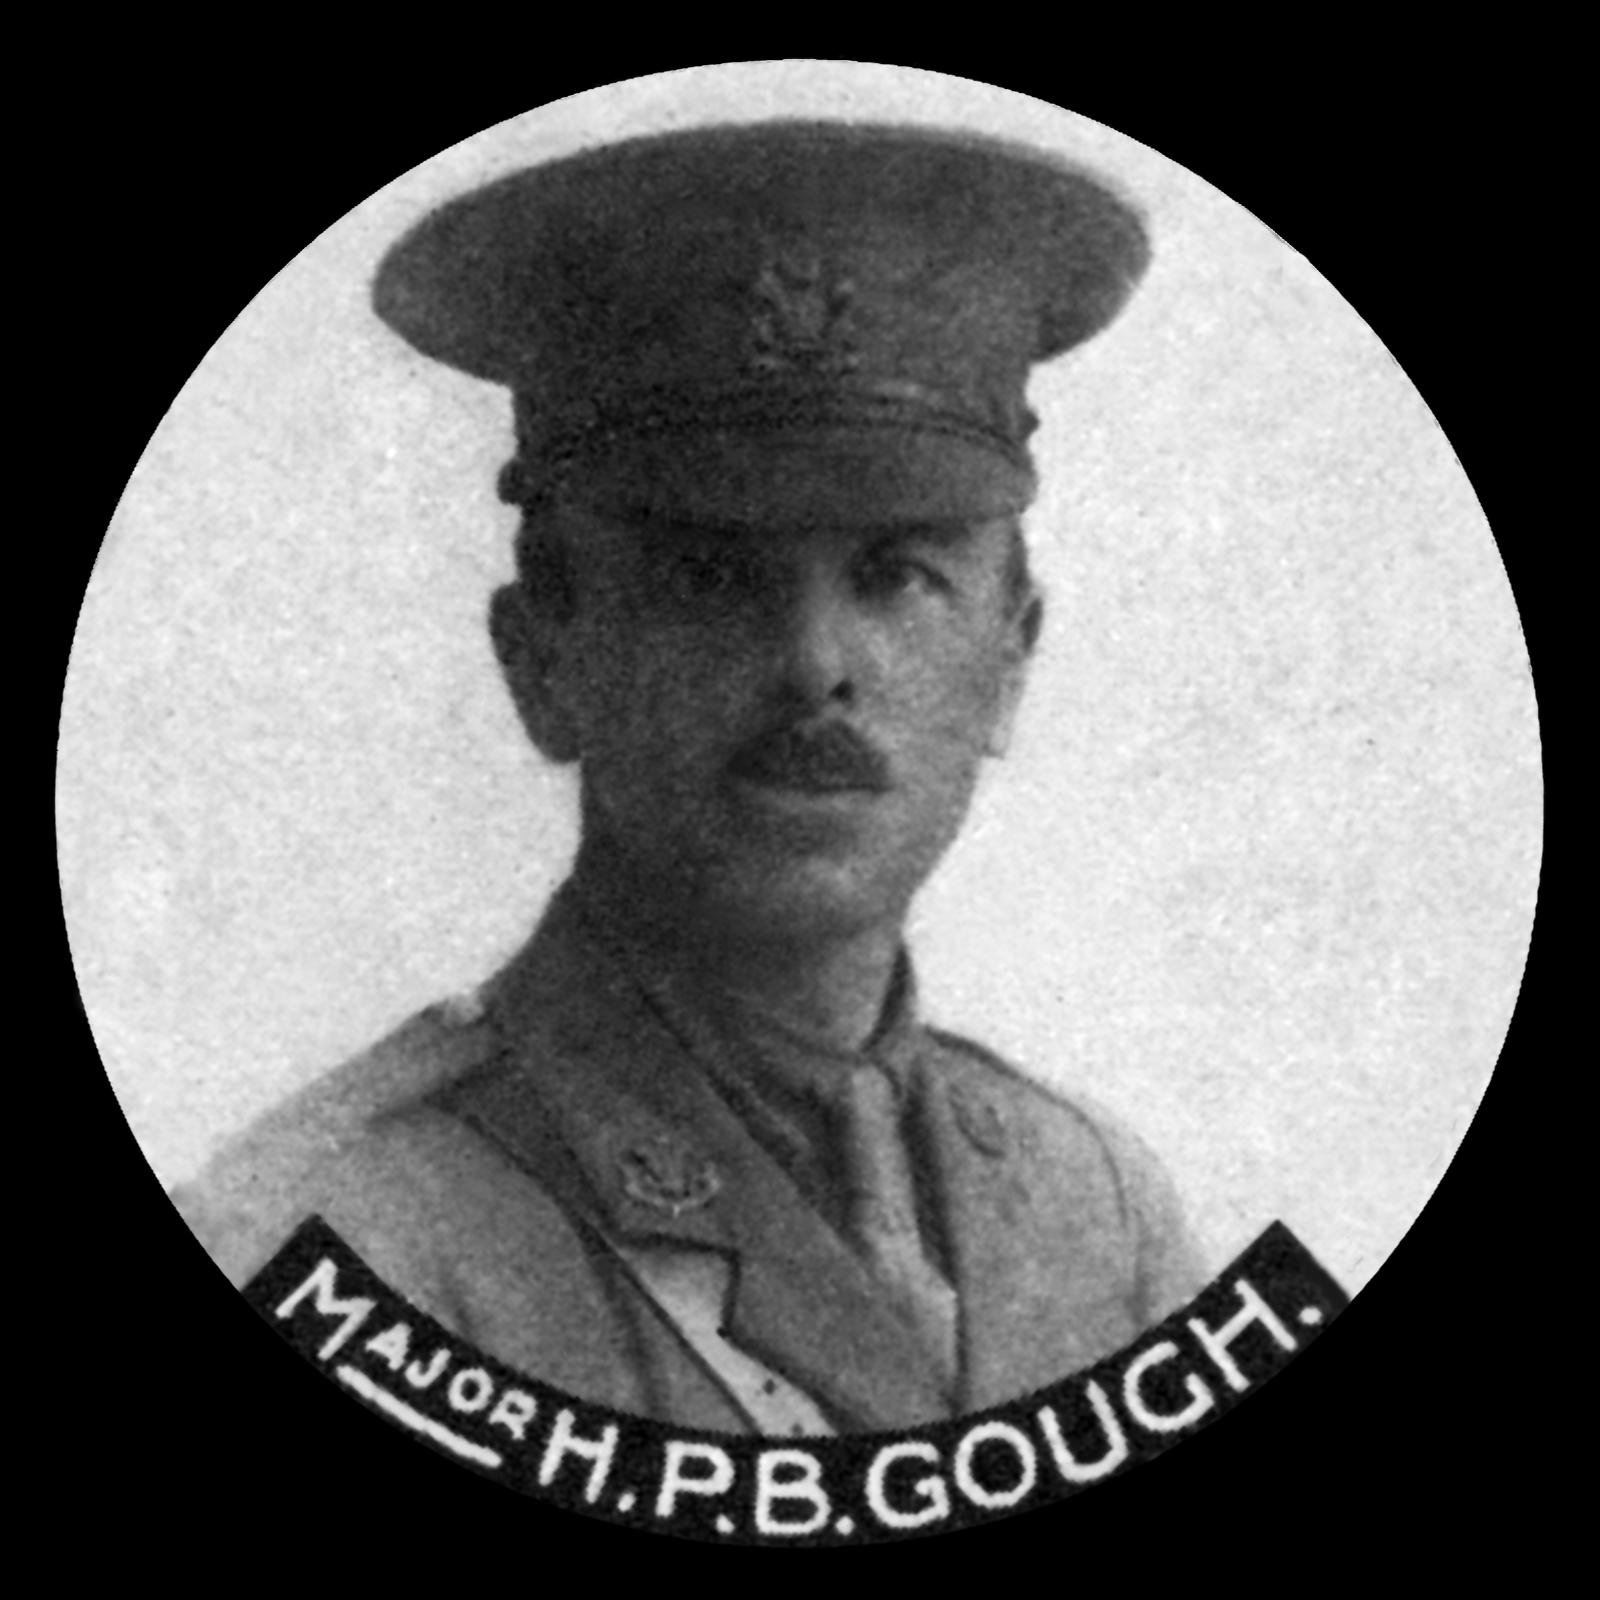 GOUGH Harry Percy Bright, MC and Bar